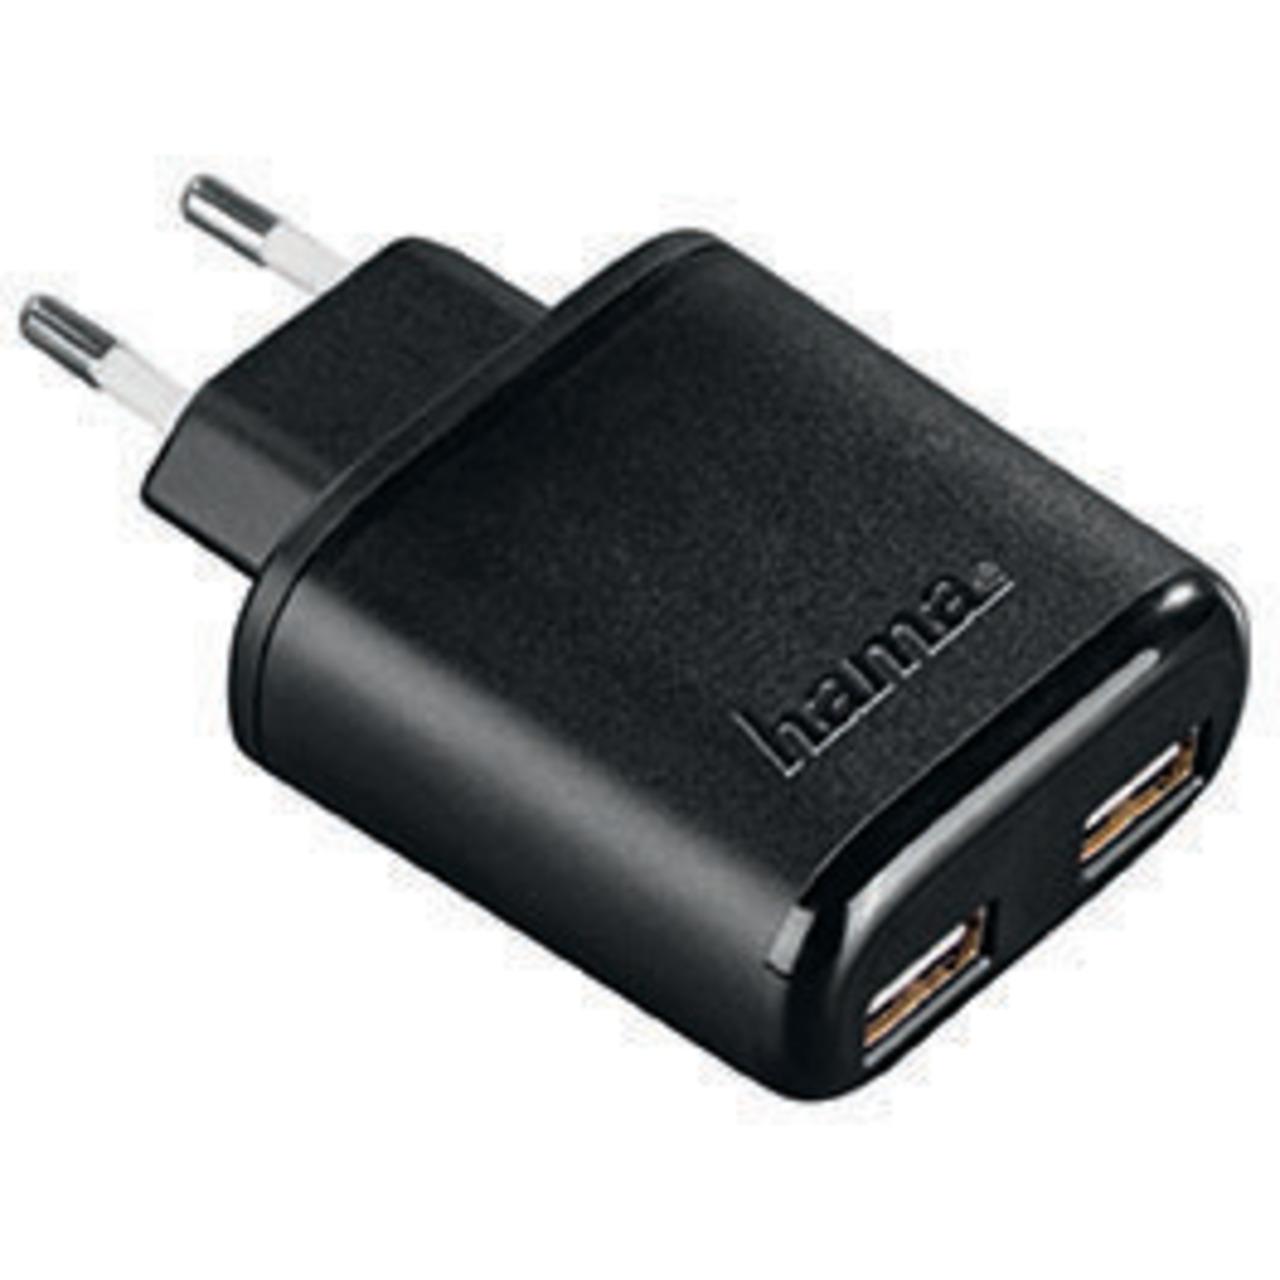 hama USB-Dual-Ladegerät 5V - 4-8A